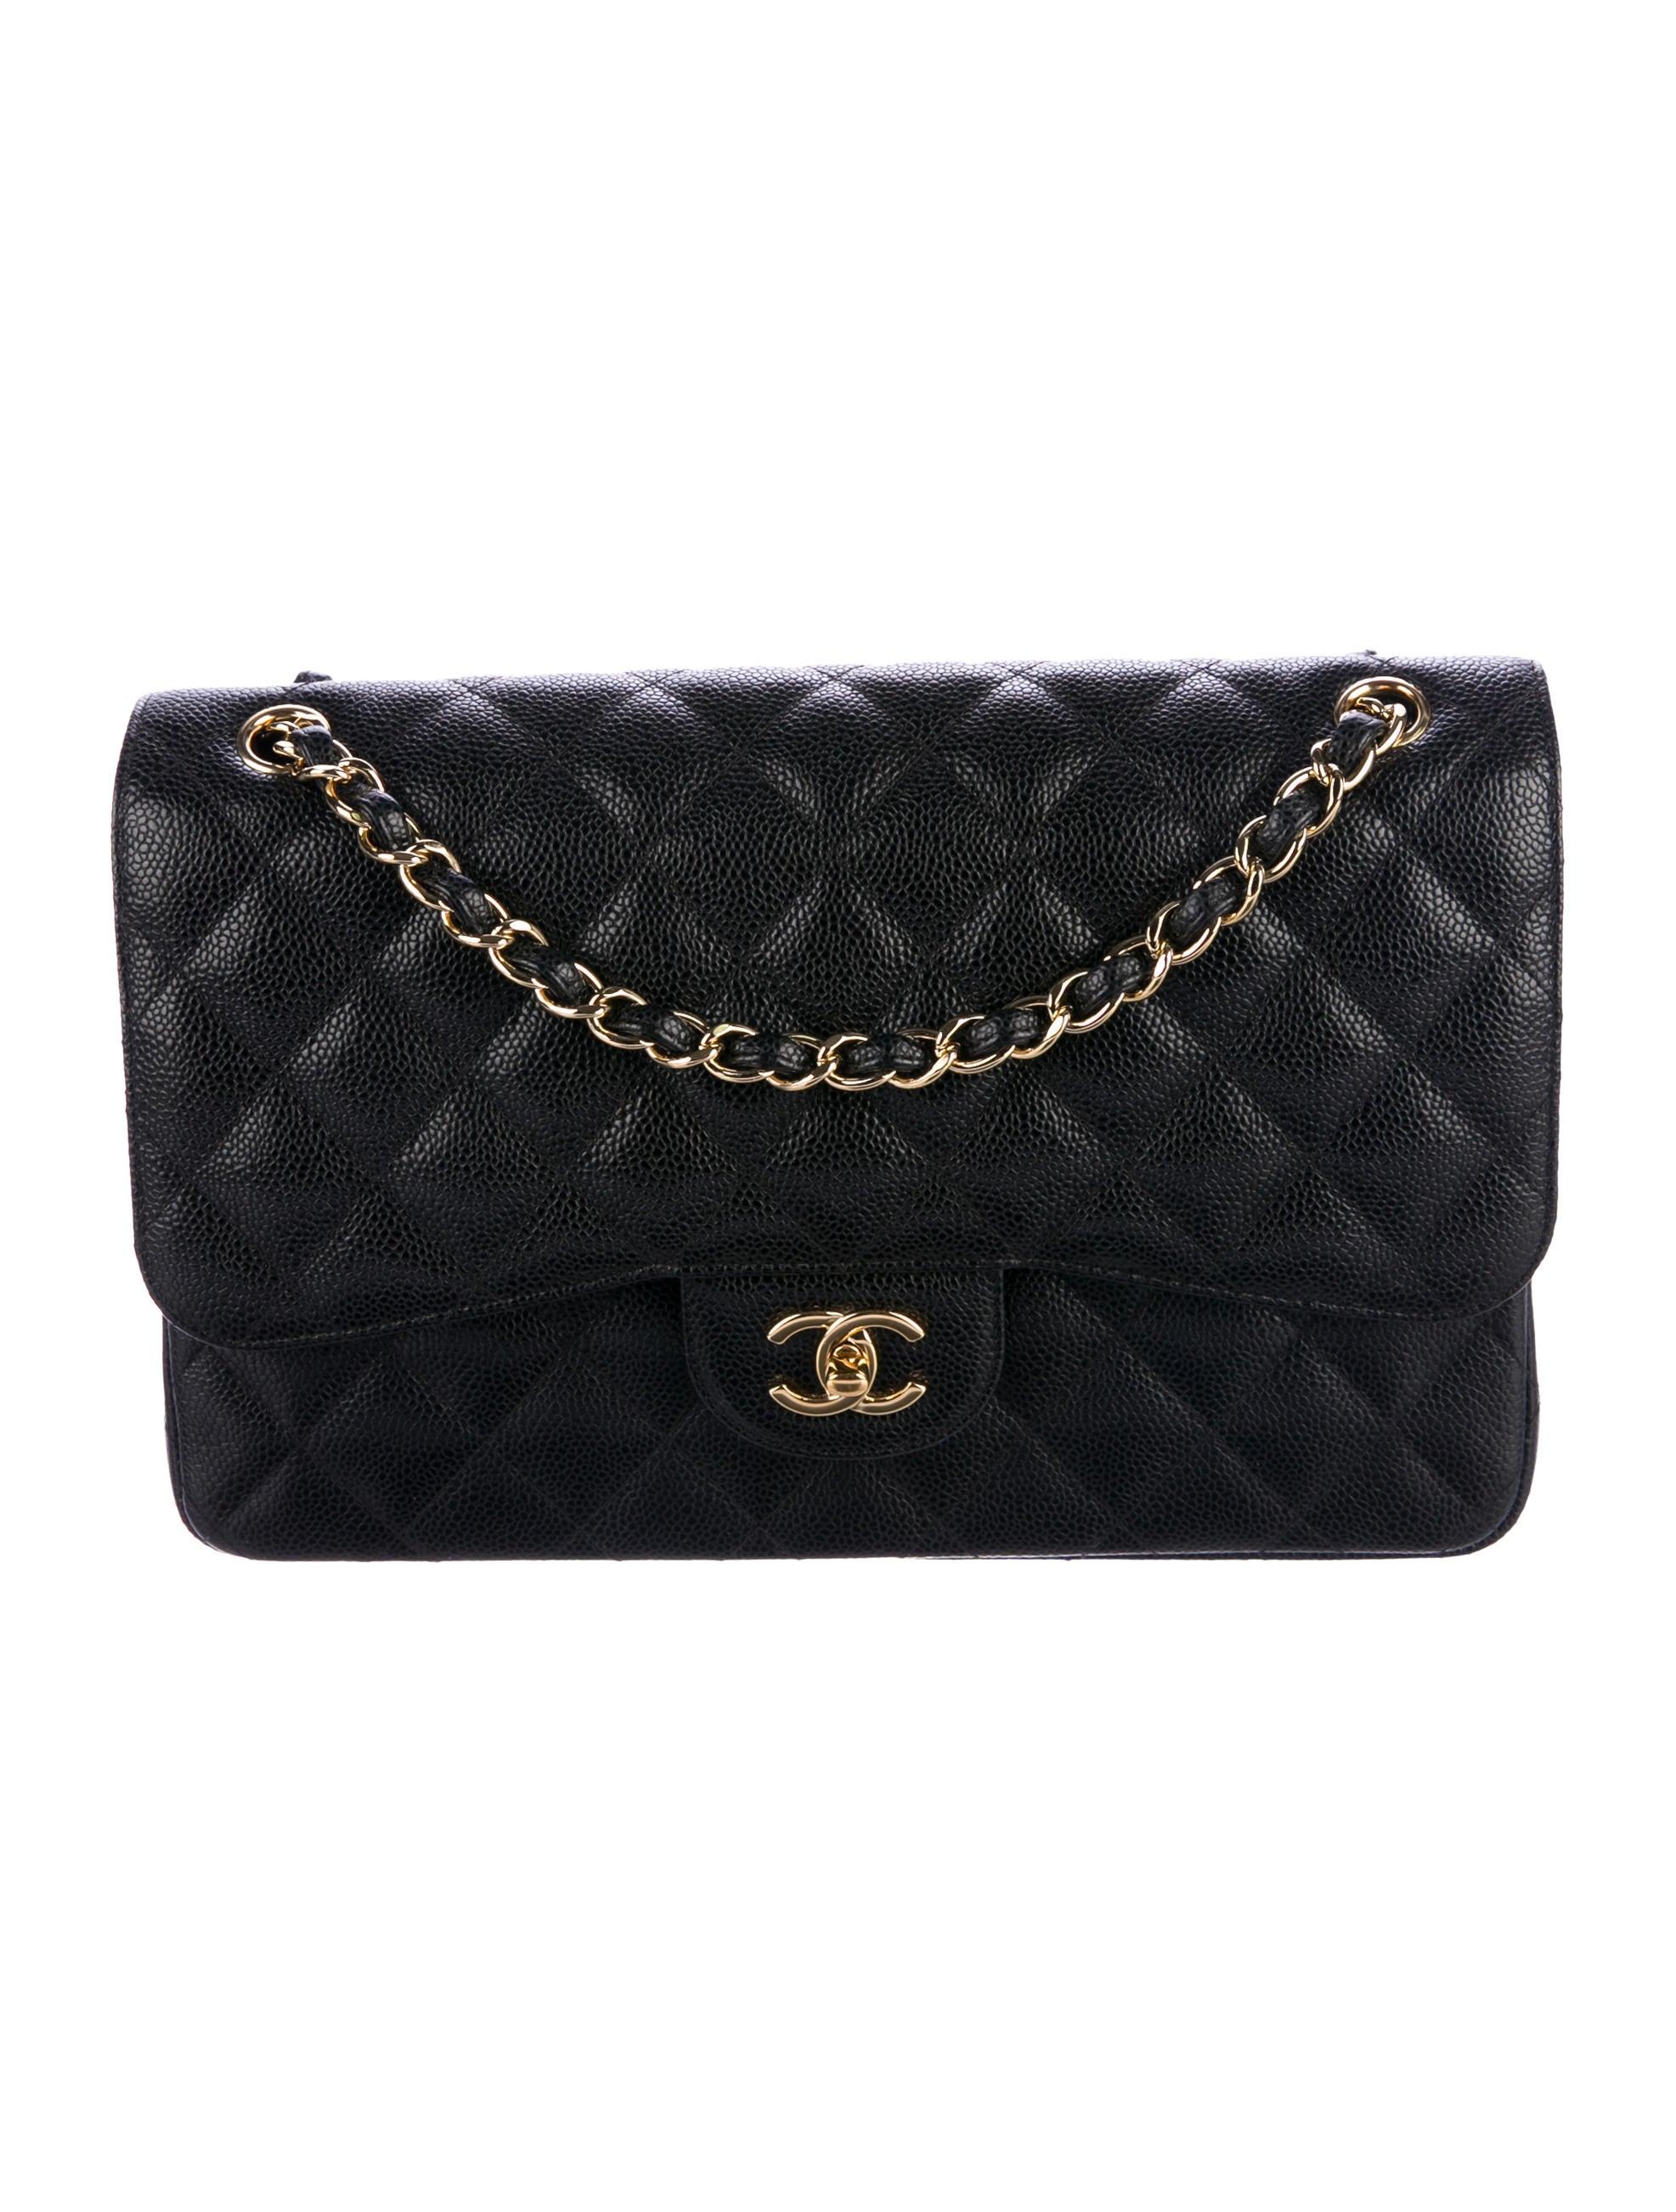 32e65612fa5f6b Chanel Caviar Shopping Bag 2015 | Stanford Center for Opportunity ...